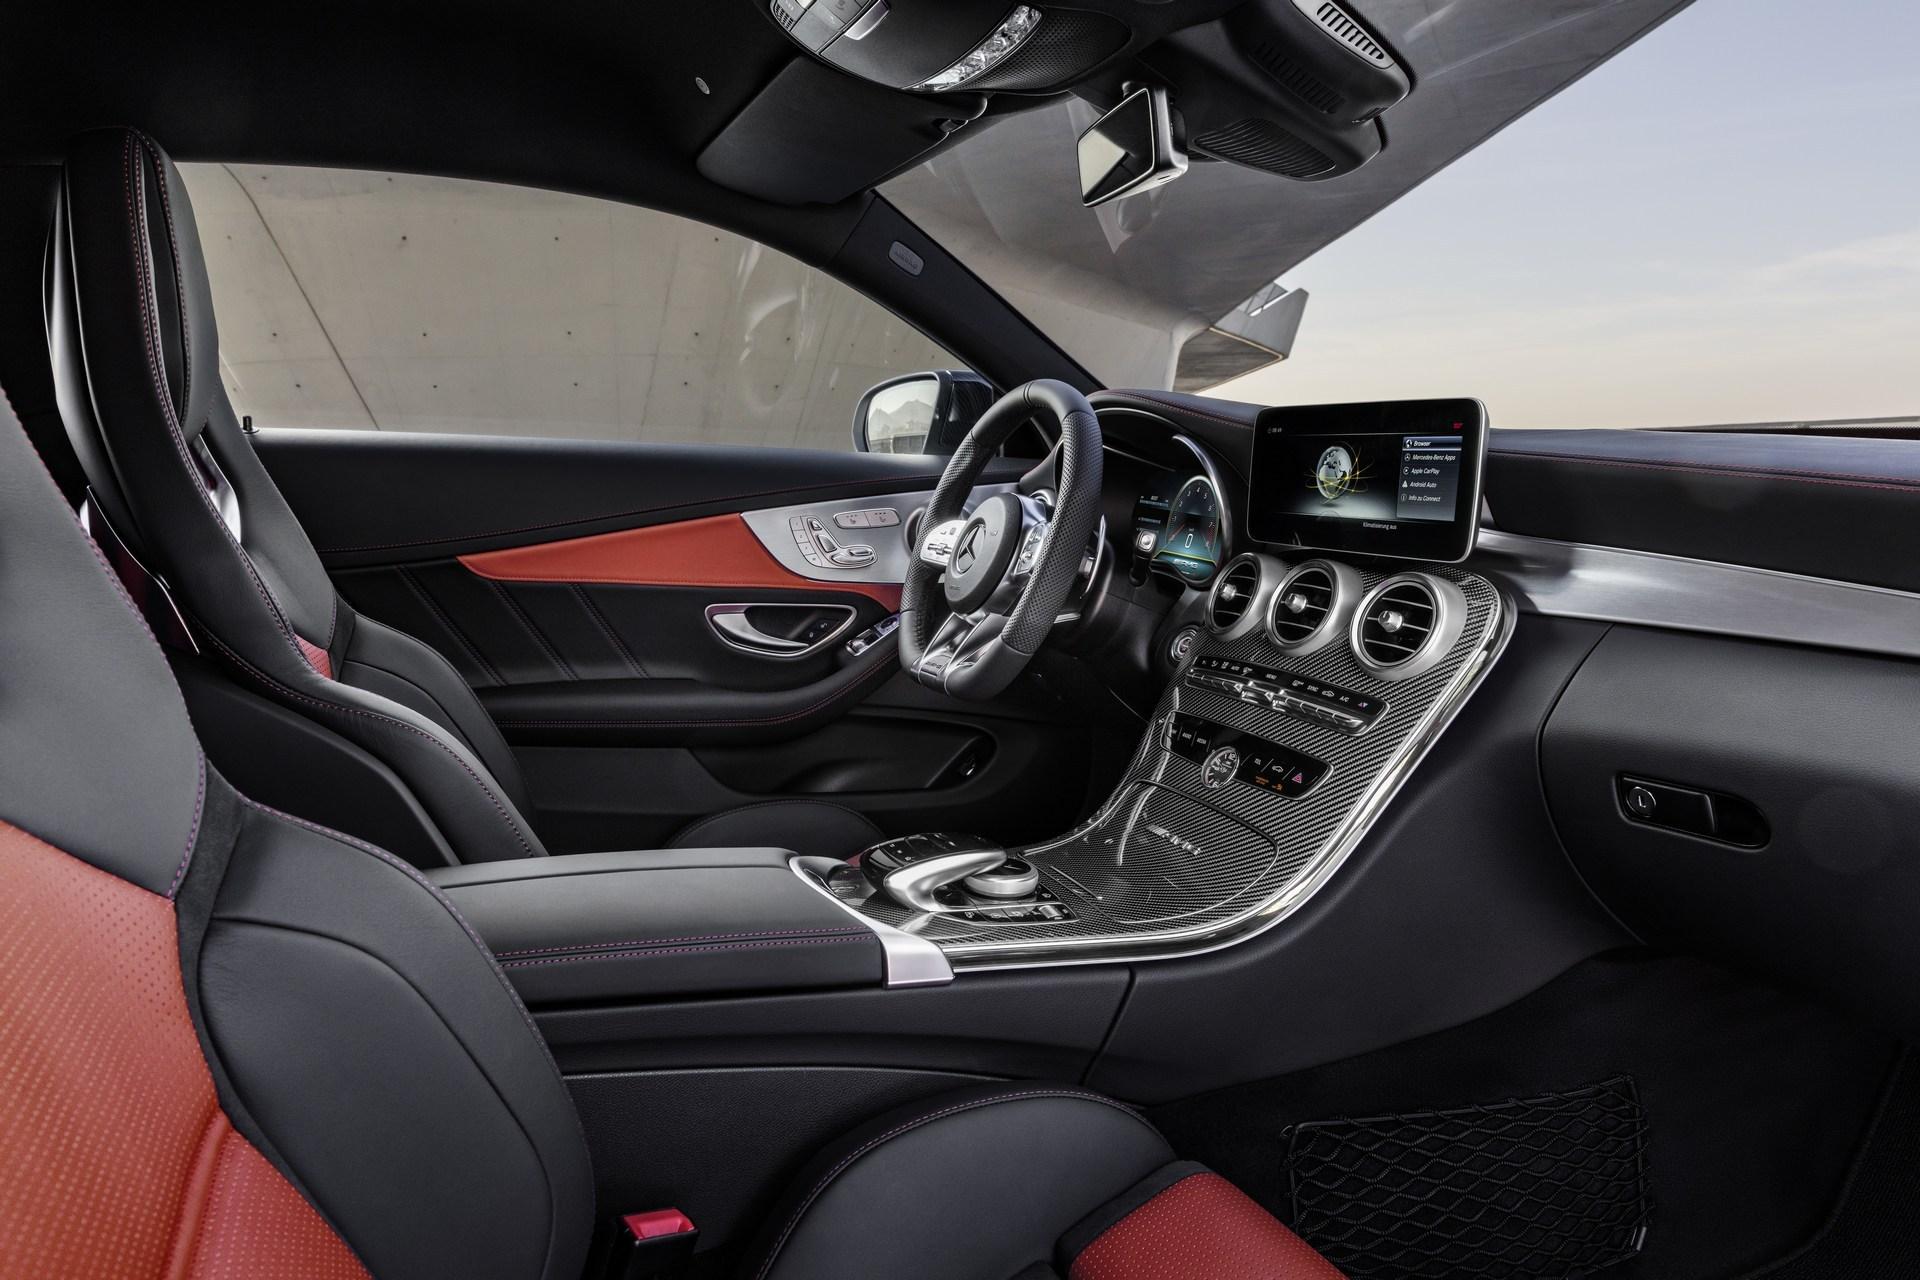 Mercedes-AMG-C63-Coupe-12.jpg